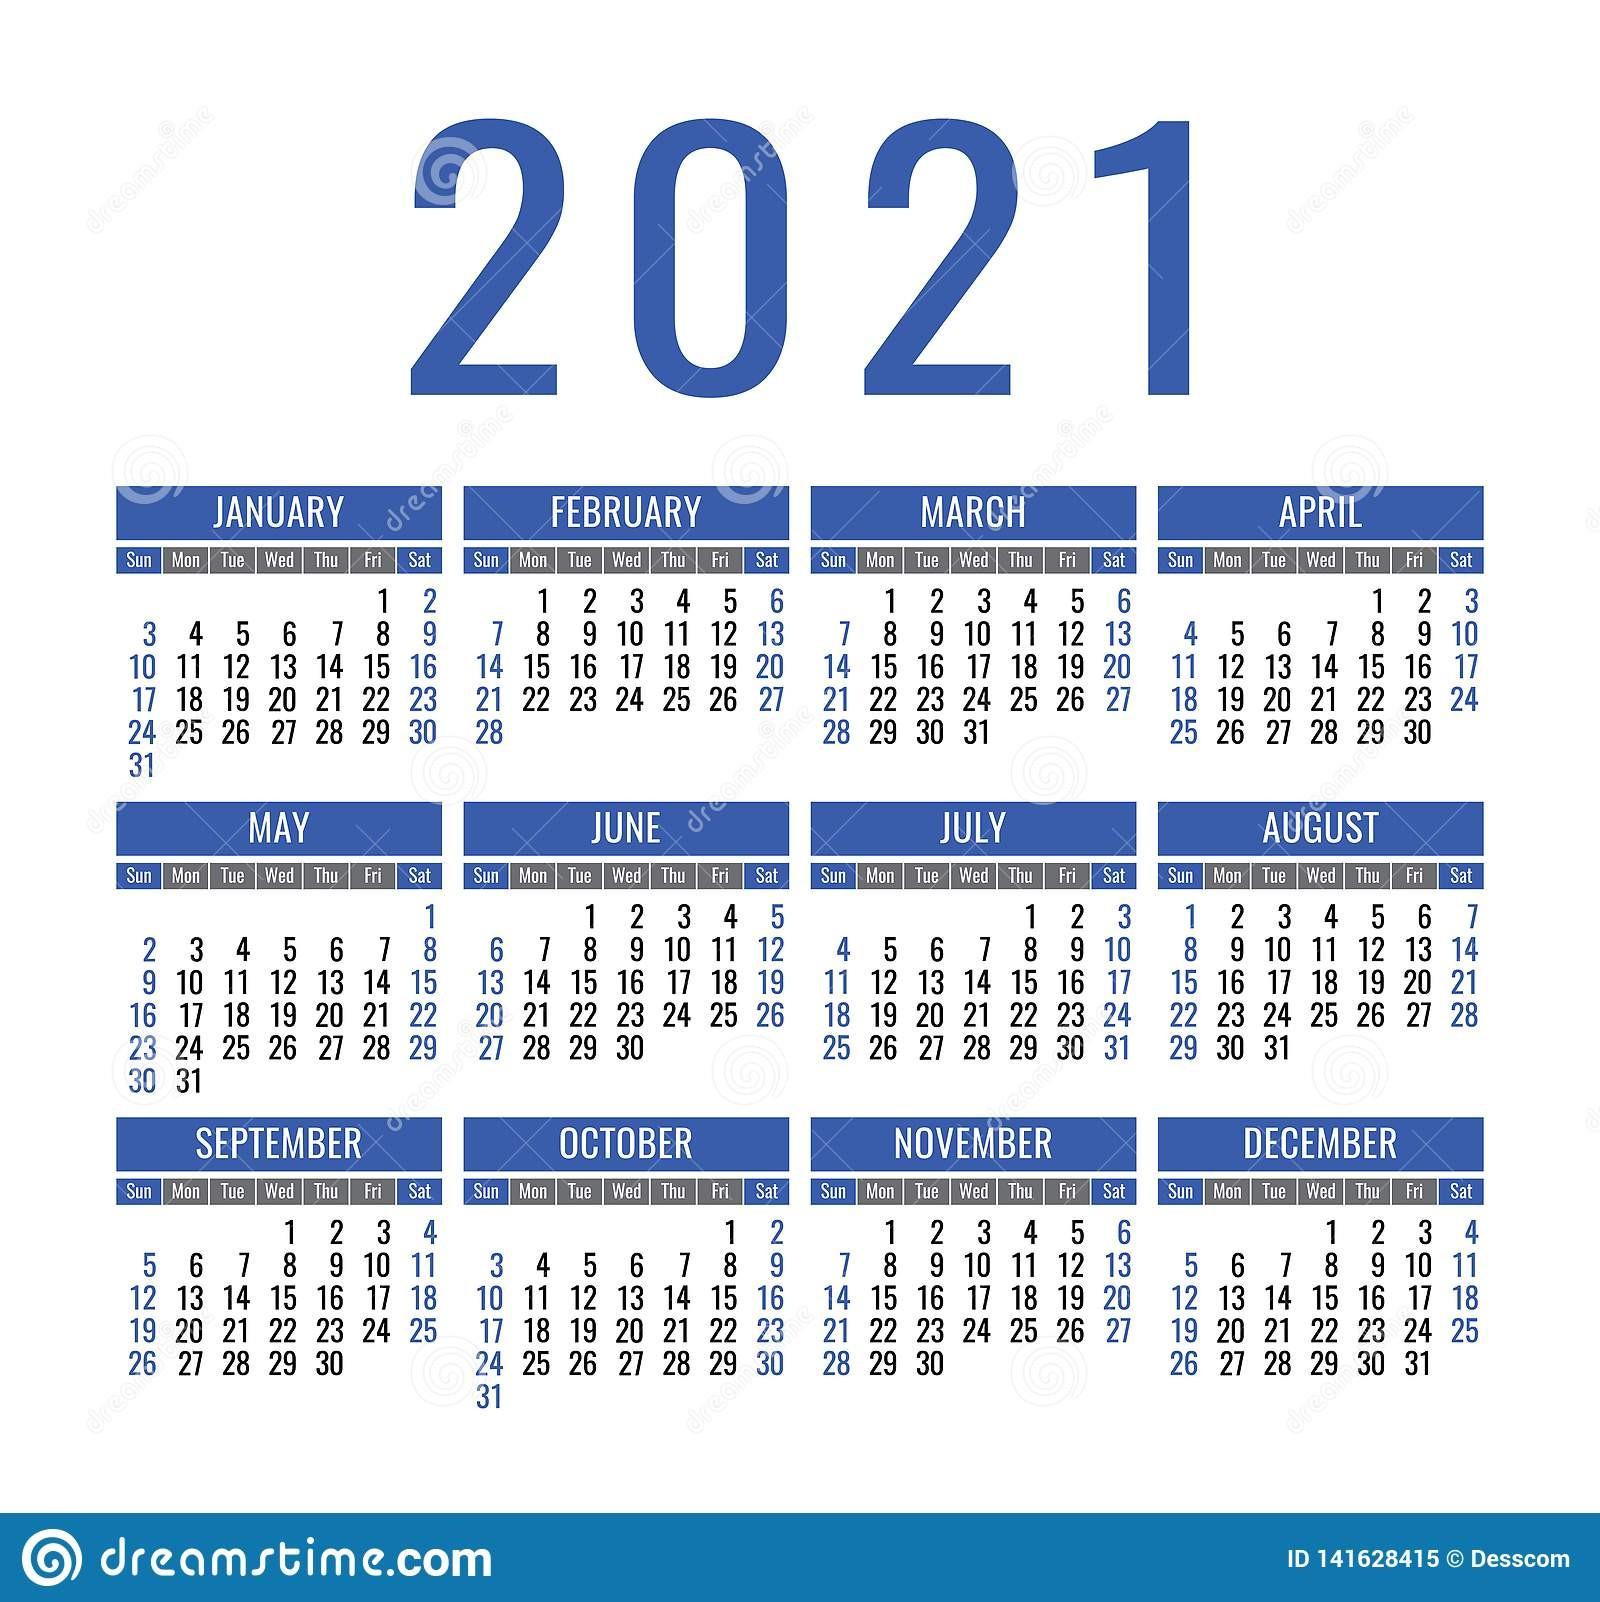 Week Calendar 2021 | Teekayshippingcorporation with regard to Broadcast Calendar 2021